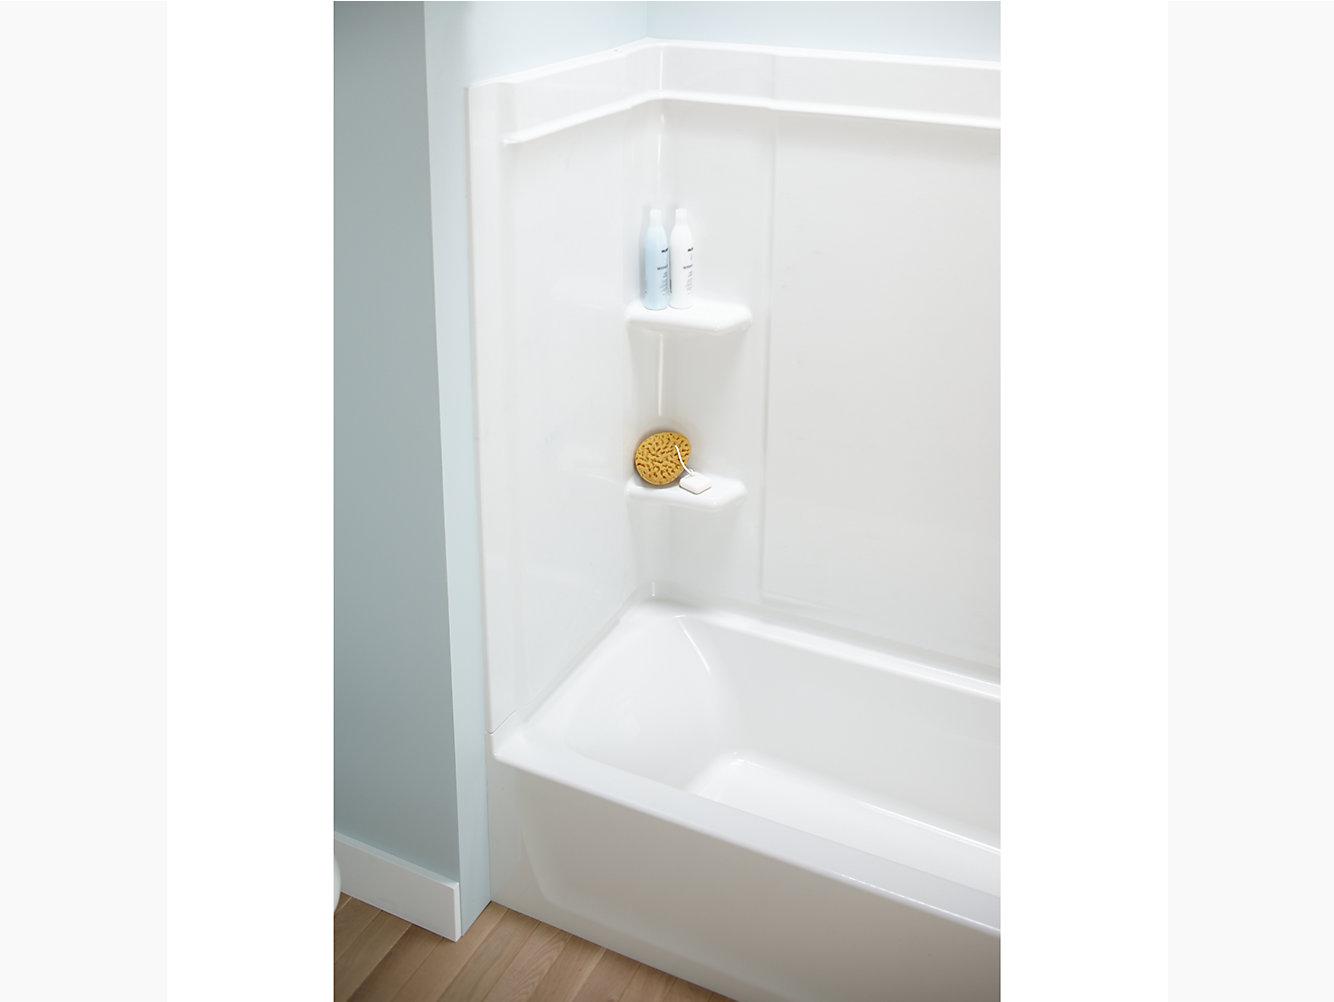 "Ensemble Medley Series 7137, 60"" x 30-1/8"" Bath/Shower | 71370110 ..."